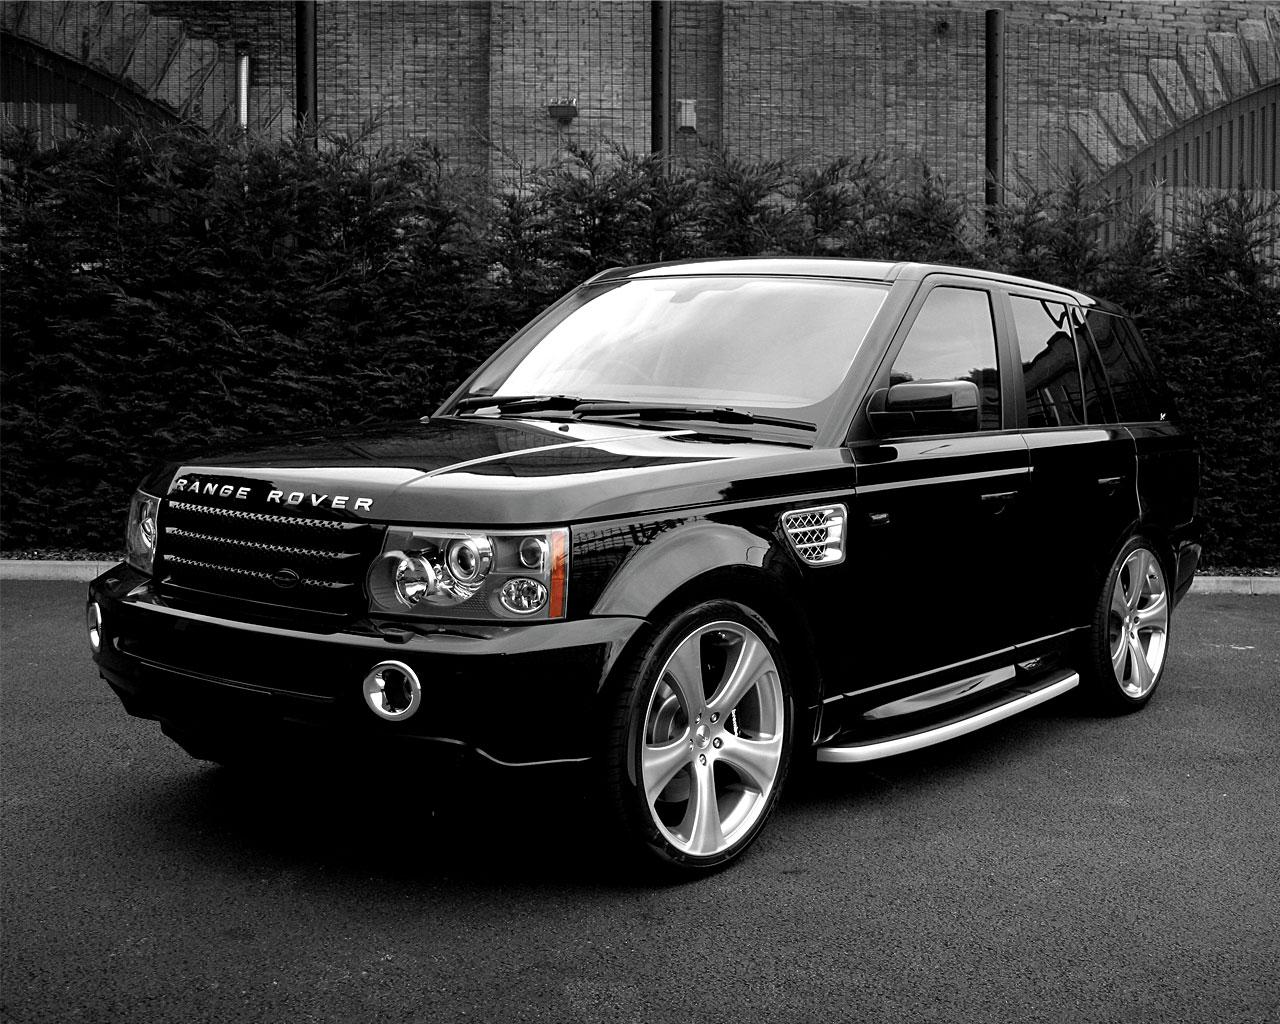 Range Rover Sport HD Wallpaper High Resolution Image Desktop Backgrounds